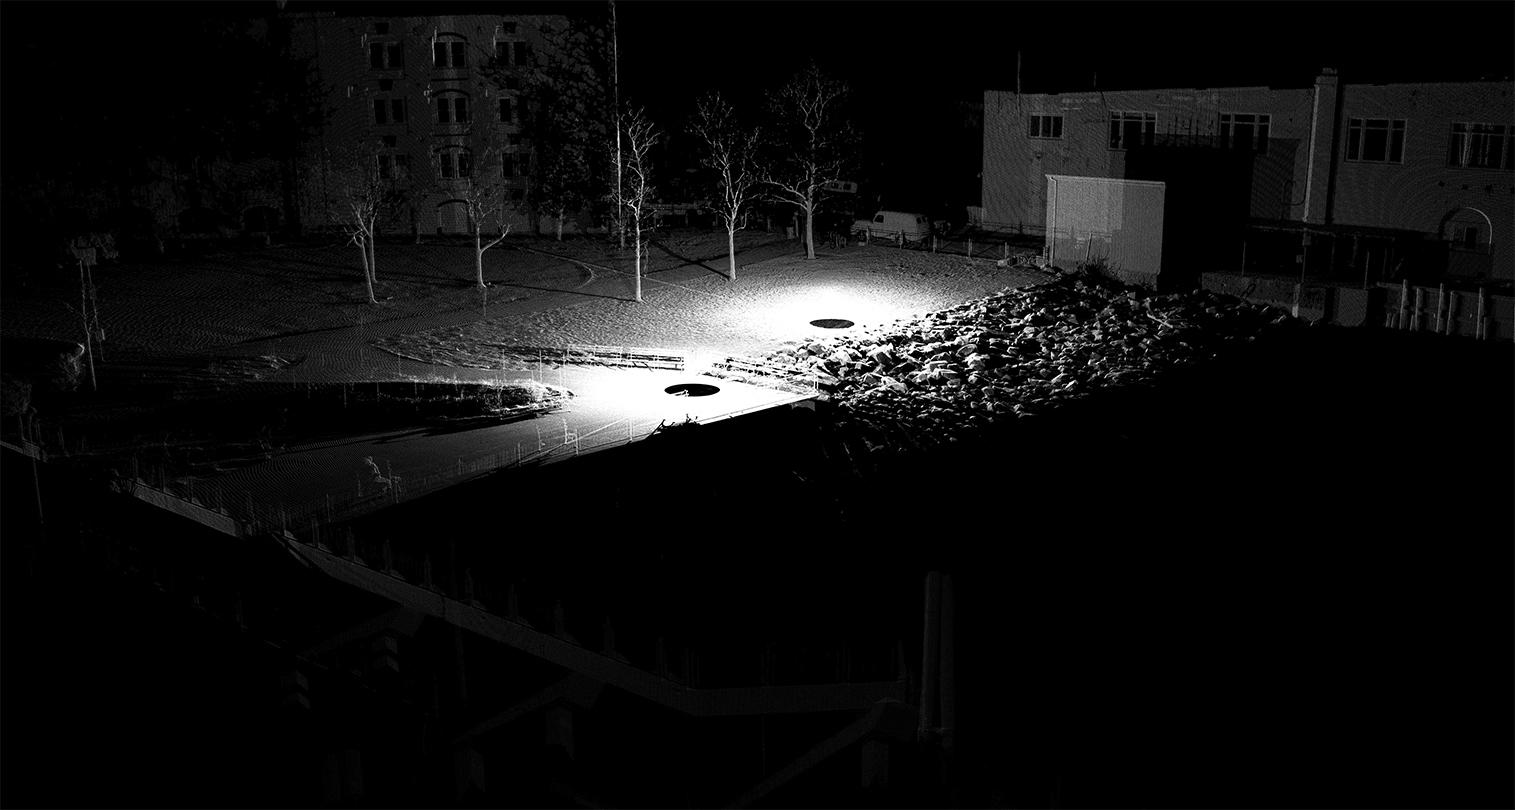 mynd-workshop-red-hook-pier-brooklyn-new-york-city-3D-laser-scanning-point-cloud-16.jpg